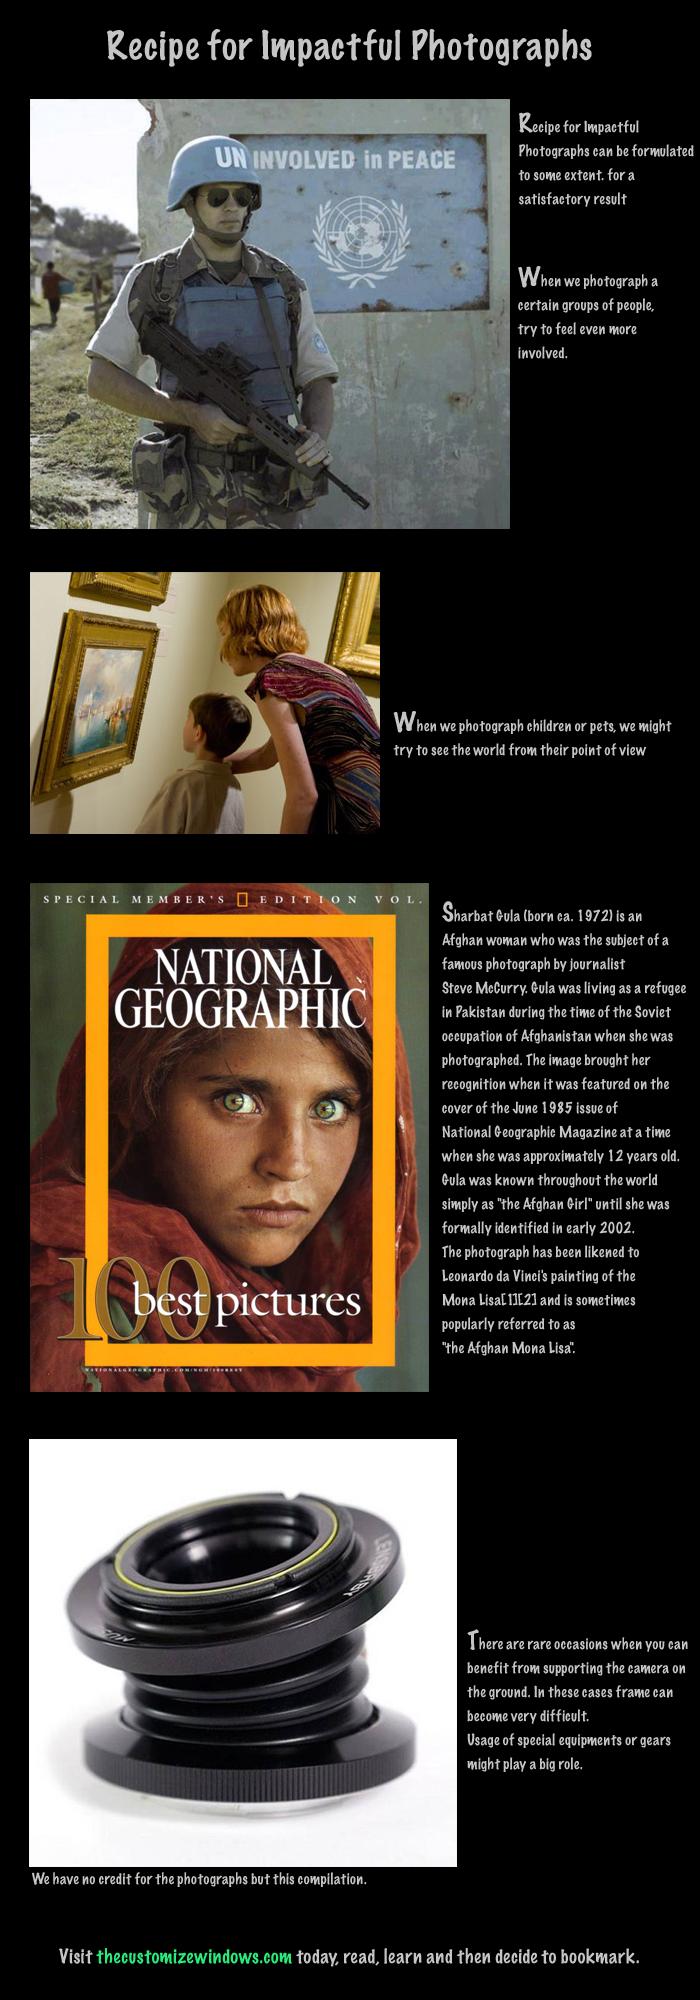 Recipe-for-Impactful-Photographs